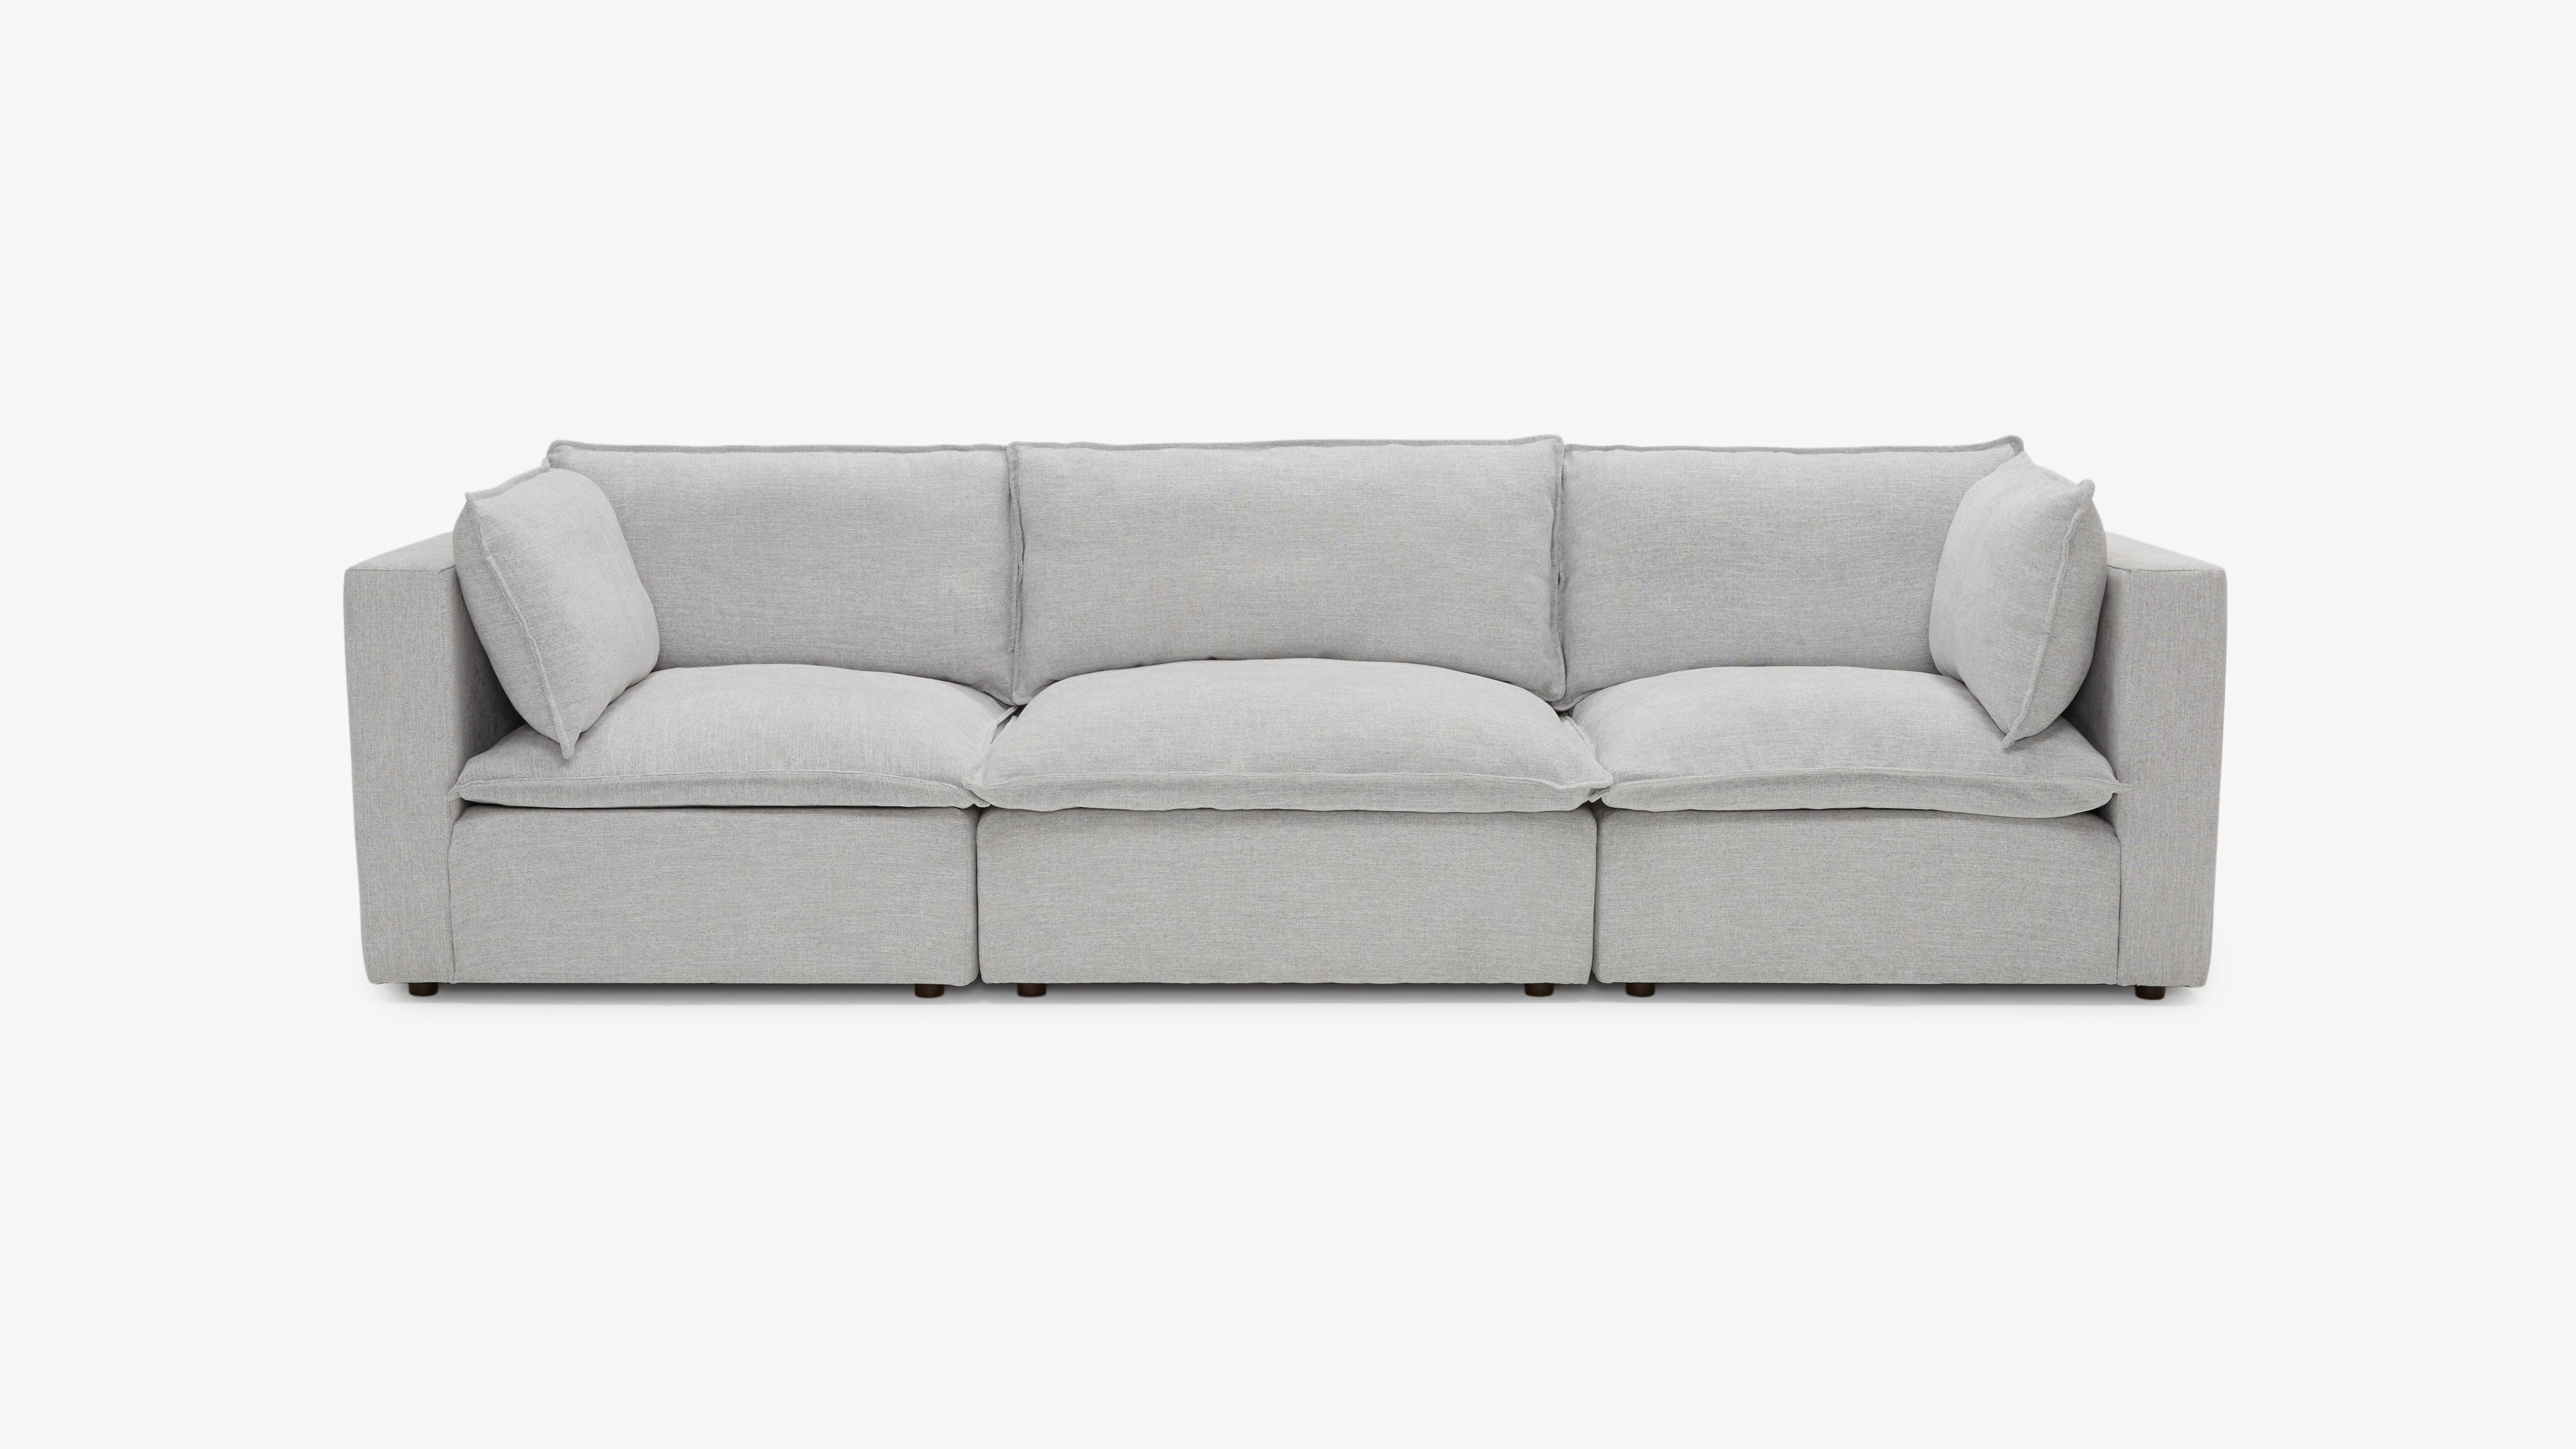 Haine Modular Sofa Milo Dove